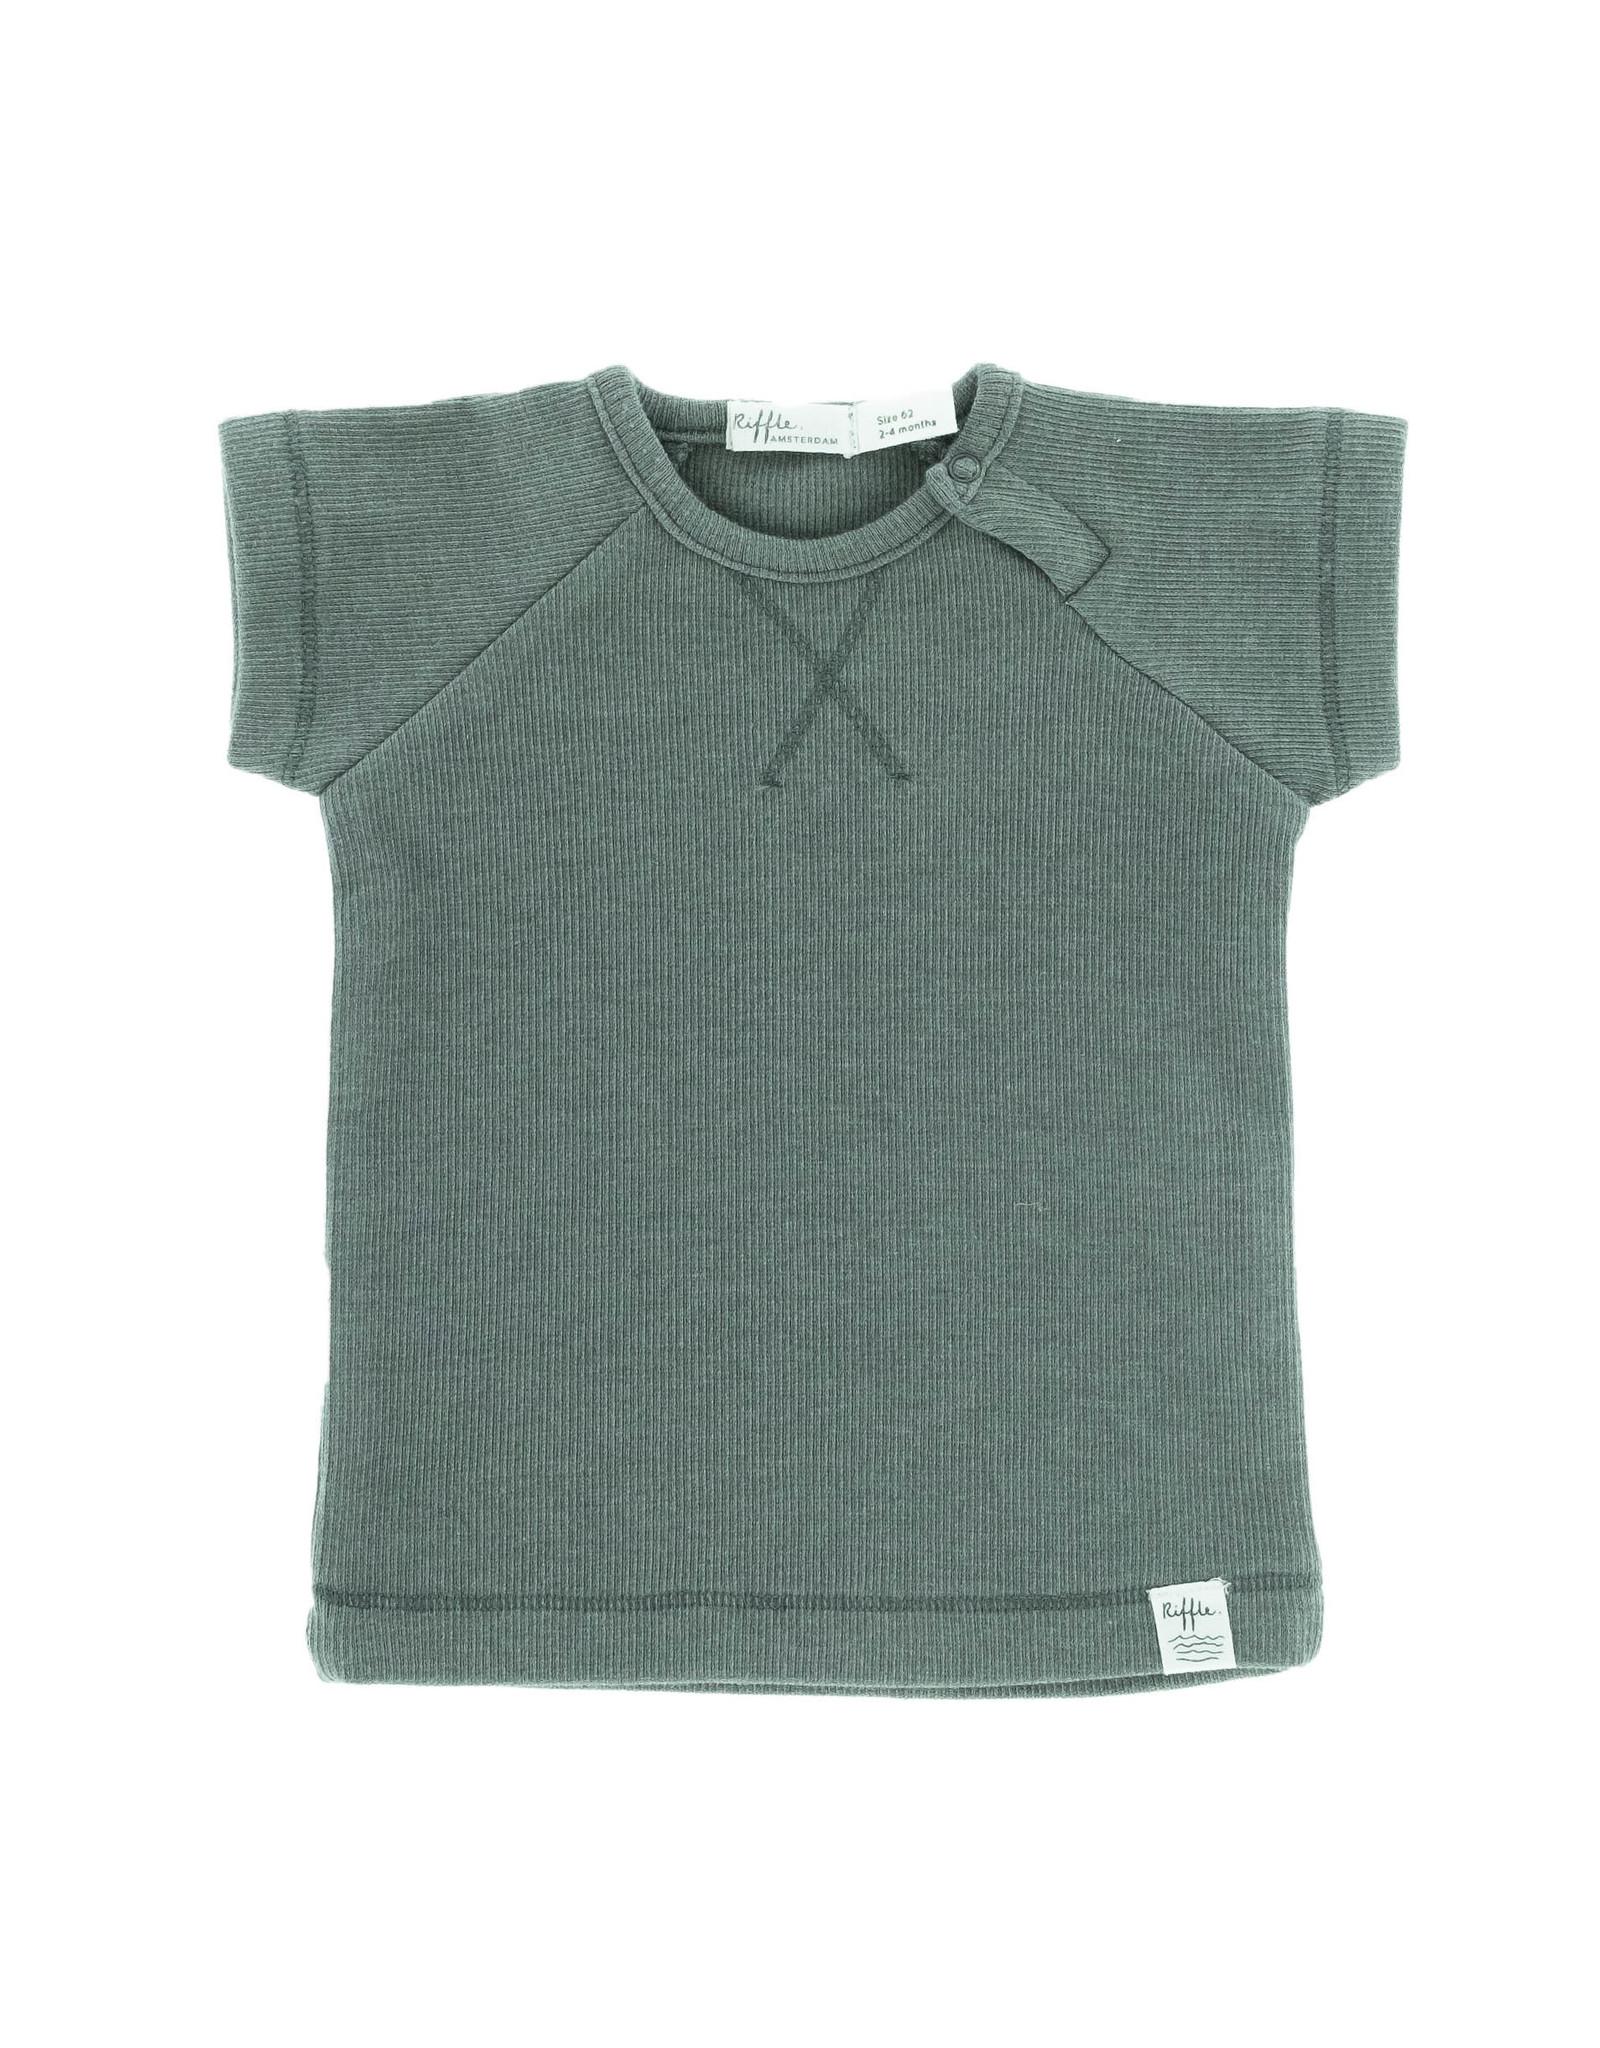 Riffle Amsterdam Riffle Amsterdam T-shirt short sleeve Grey